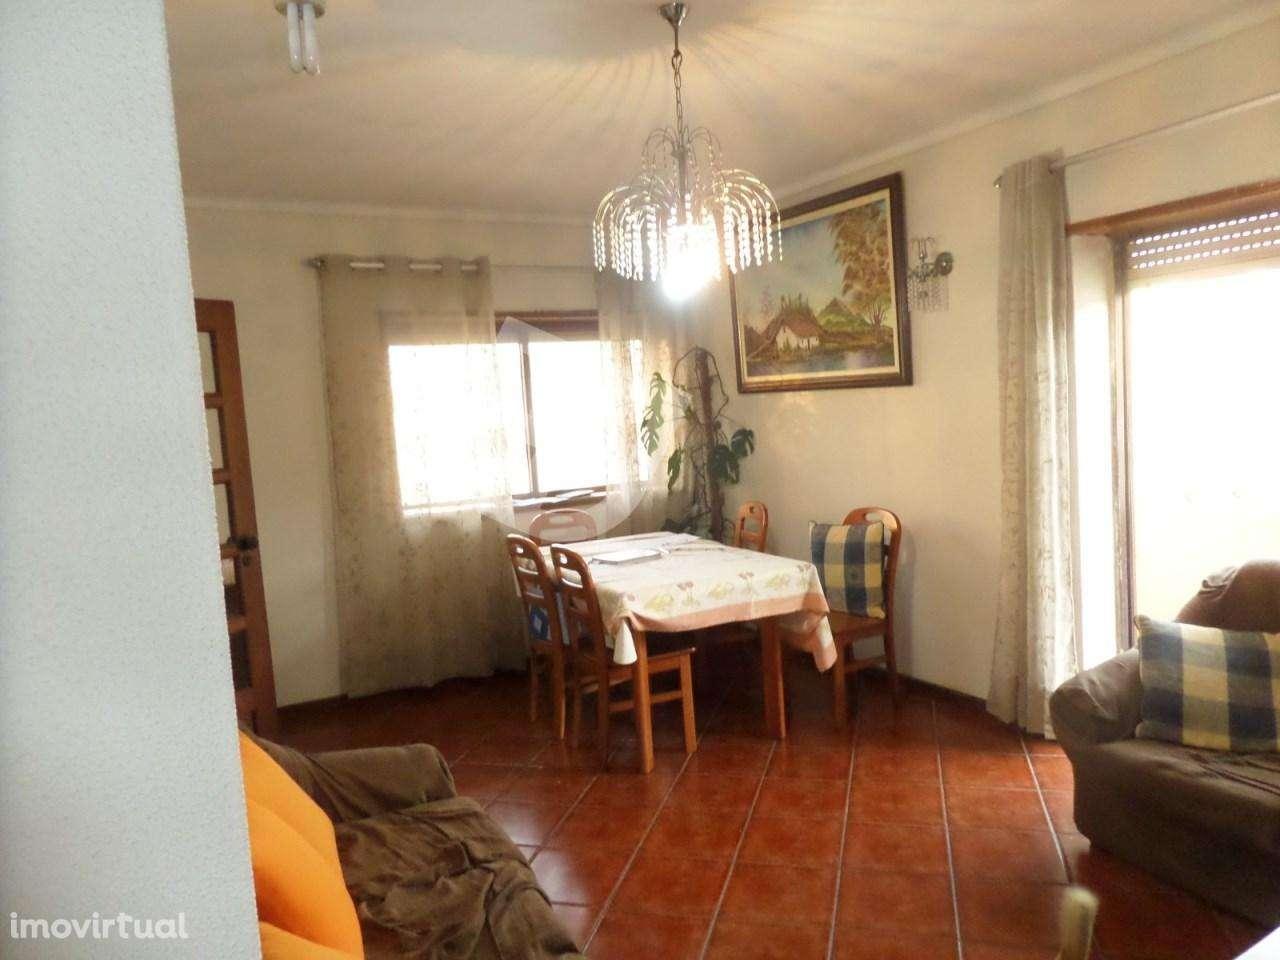 Apartamento para comprar, Gafanha da Nazaré, Aveiro - Foto 1